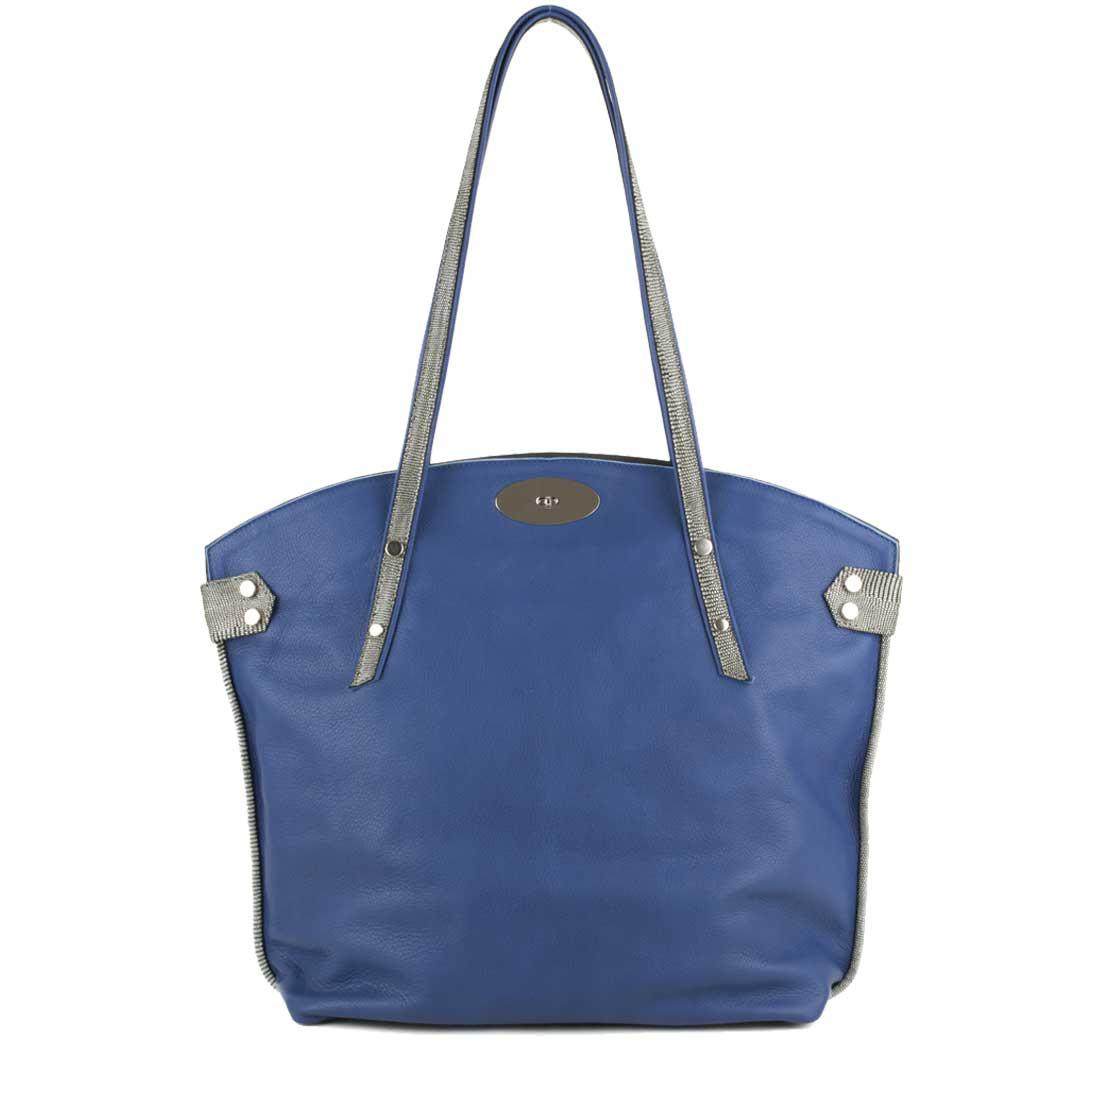 Tamara Blue Leather Tote Bag